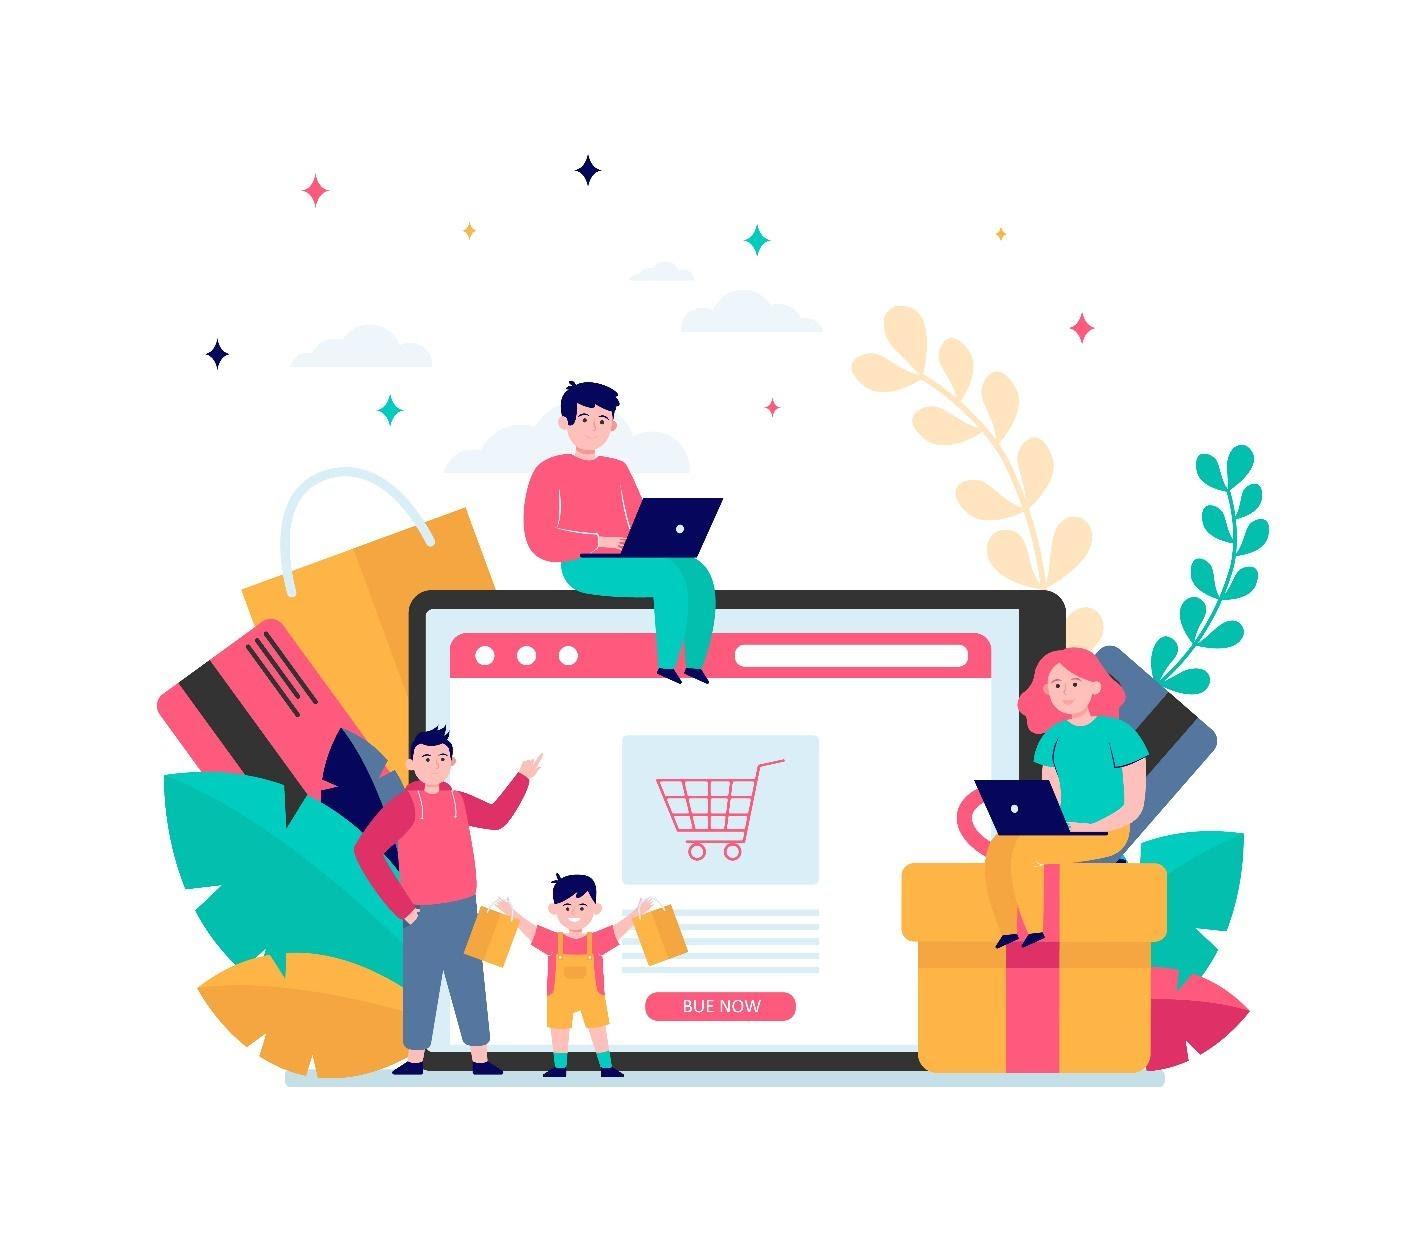 maropost - multi-channel eCommerce platform